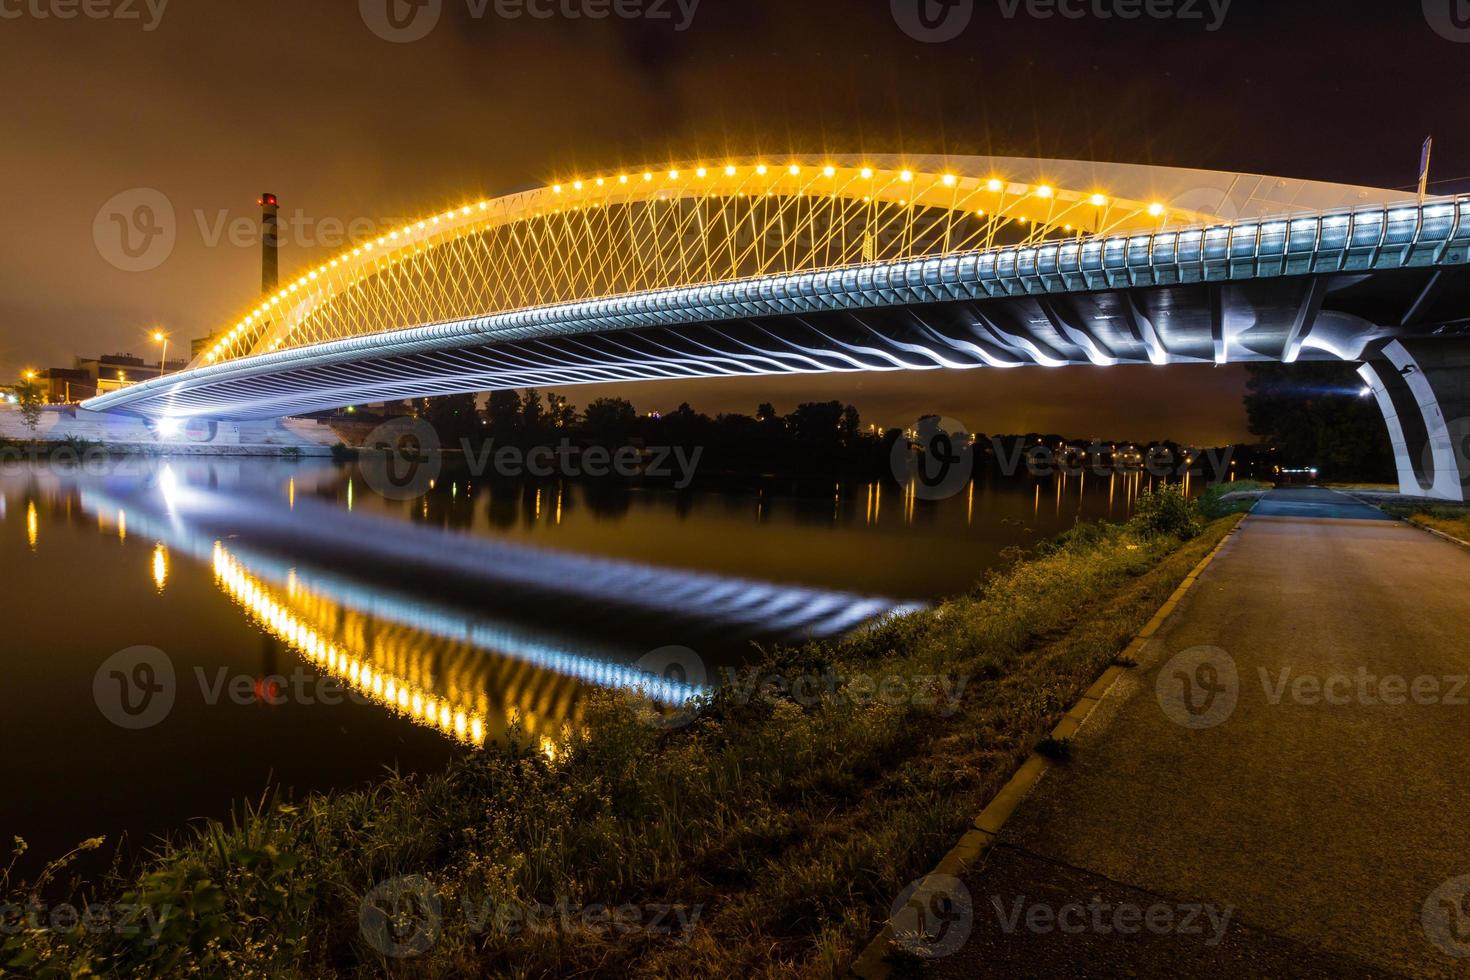 vista notturna del ponte di troja, vltava, praga, repubblica ceca foto